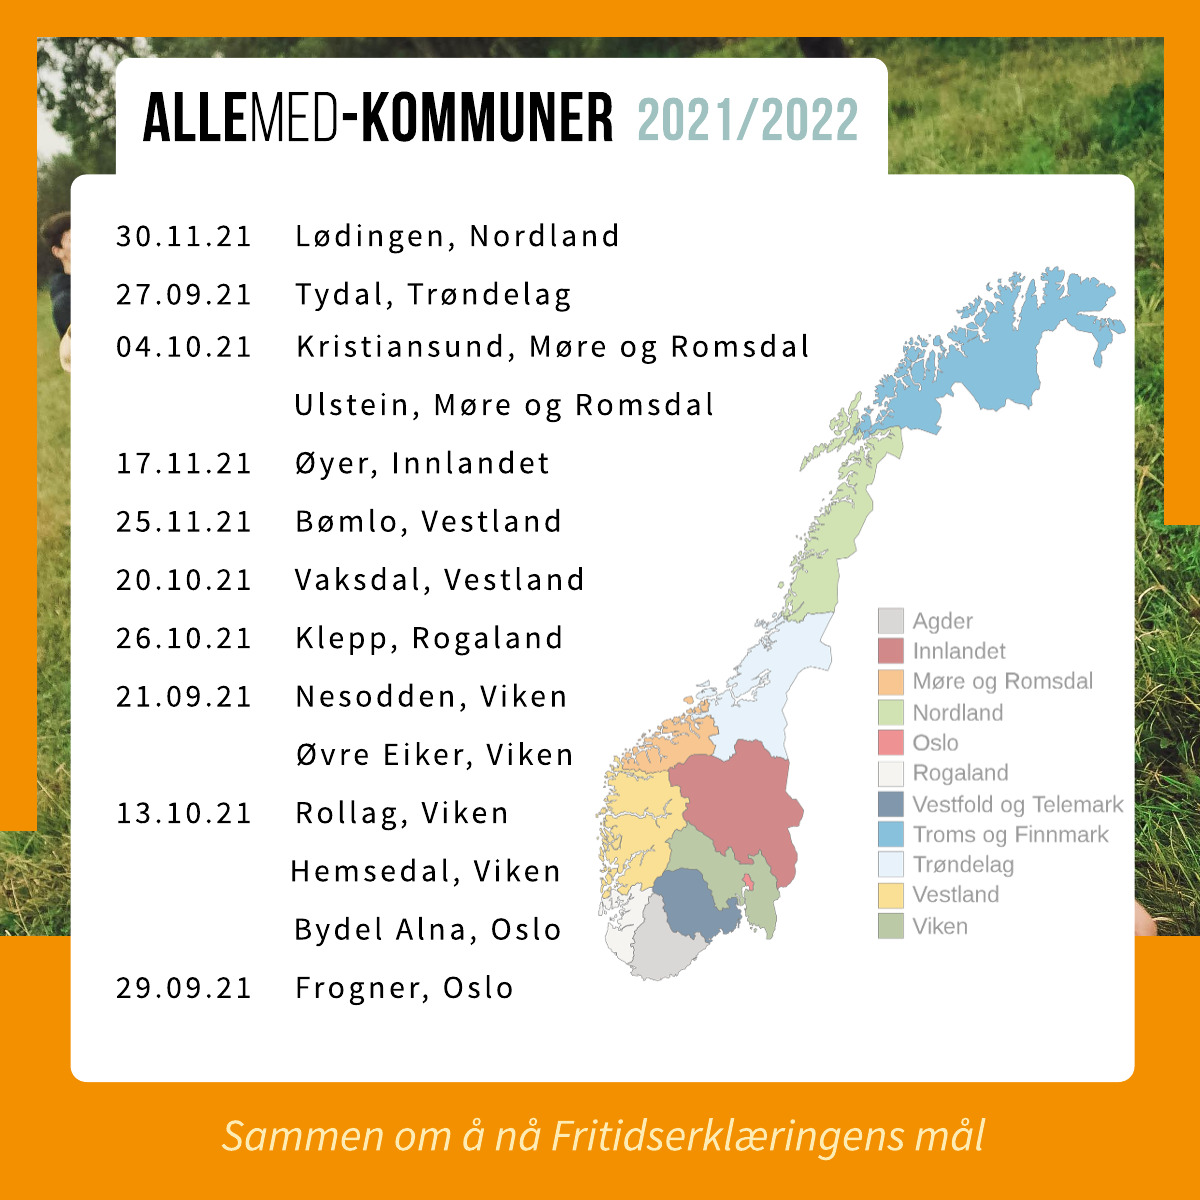 ALLEMED-kommuner 2021/2022 er Lødingen i Nordland, Tydal i Trøndelag, Kristiansund og Ulstein i Møre og Romsdal, Øyer i Innlandet, Bømlo og Vaksdal i Vestland, Klepp i Rogaland, Nesodden, Øvre Eiker, Rollag og Hemsedal i Viken, Bydel Alna og bydel Frogner i Oslo